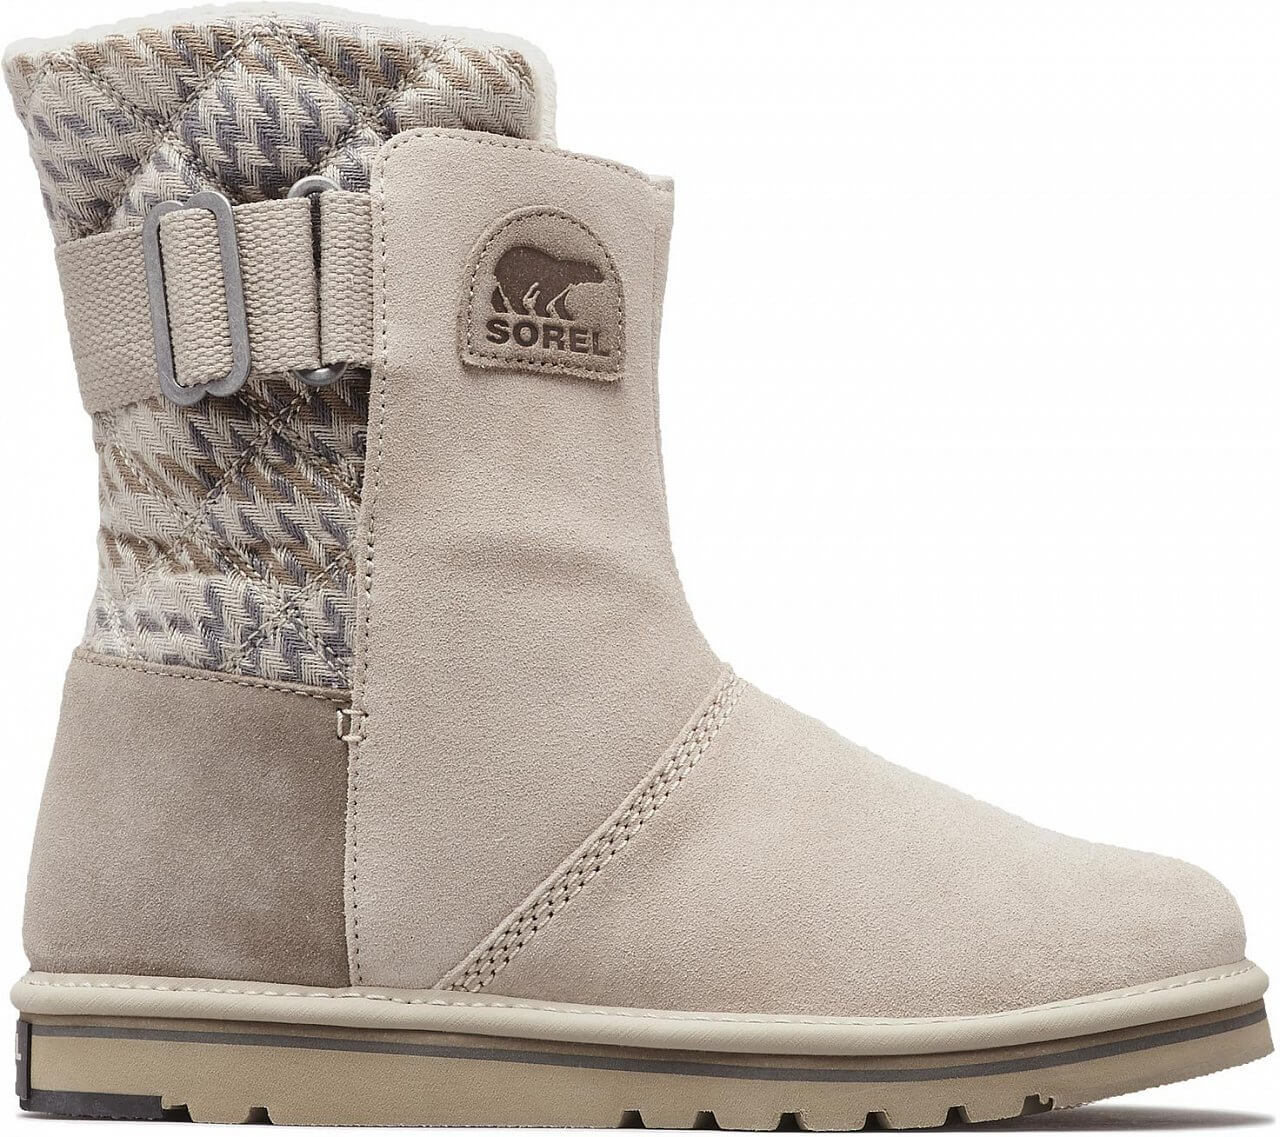 5544ba7735ad Dámske zimné topánky Sorel Newbie